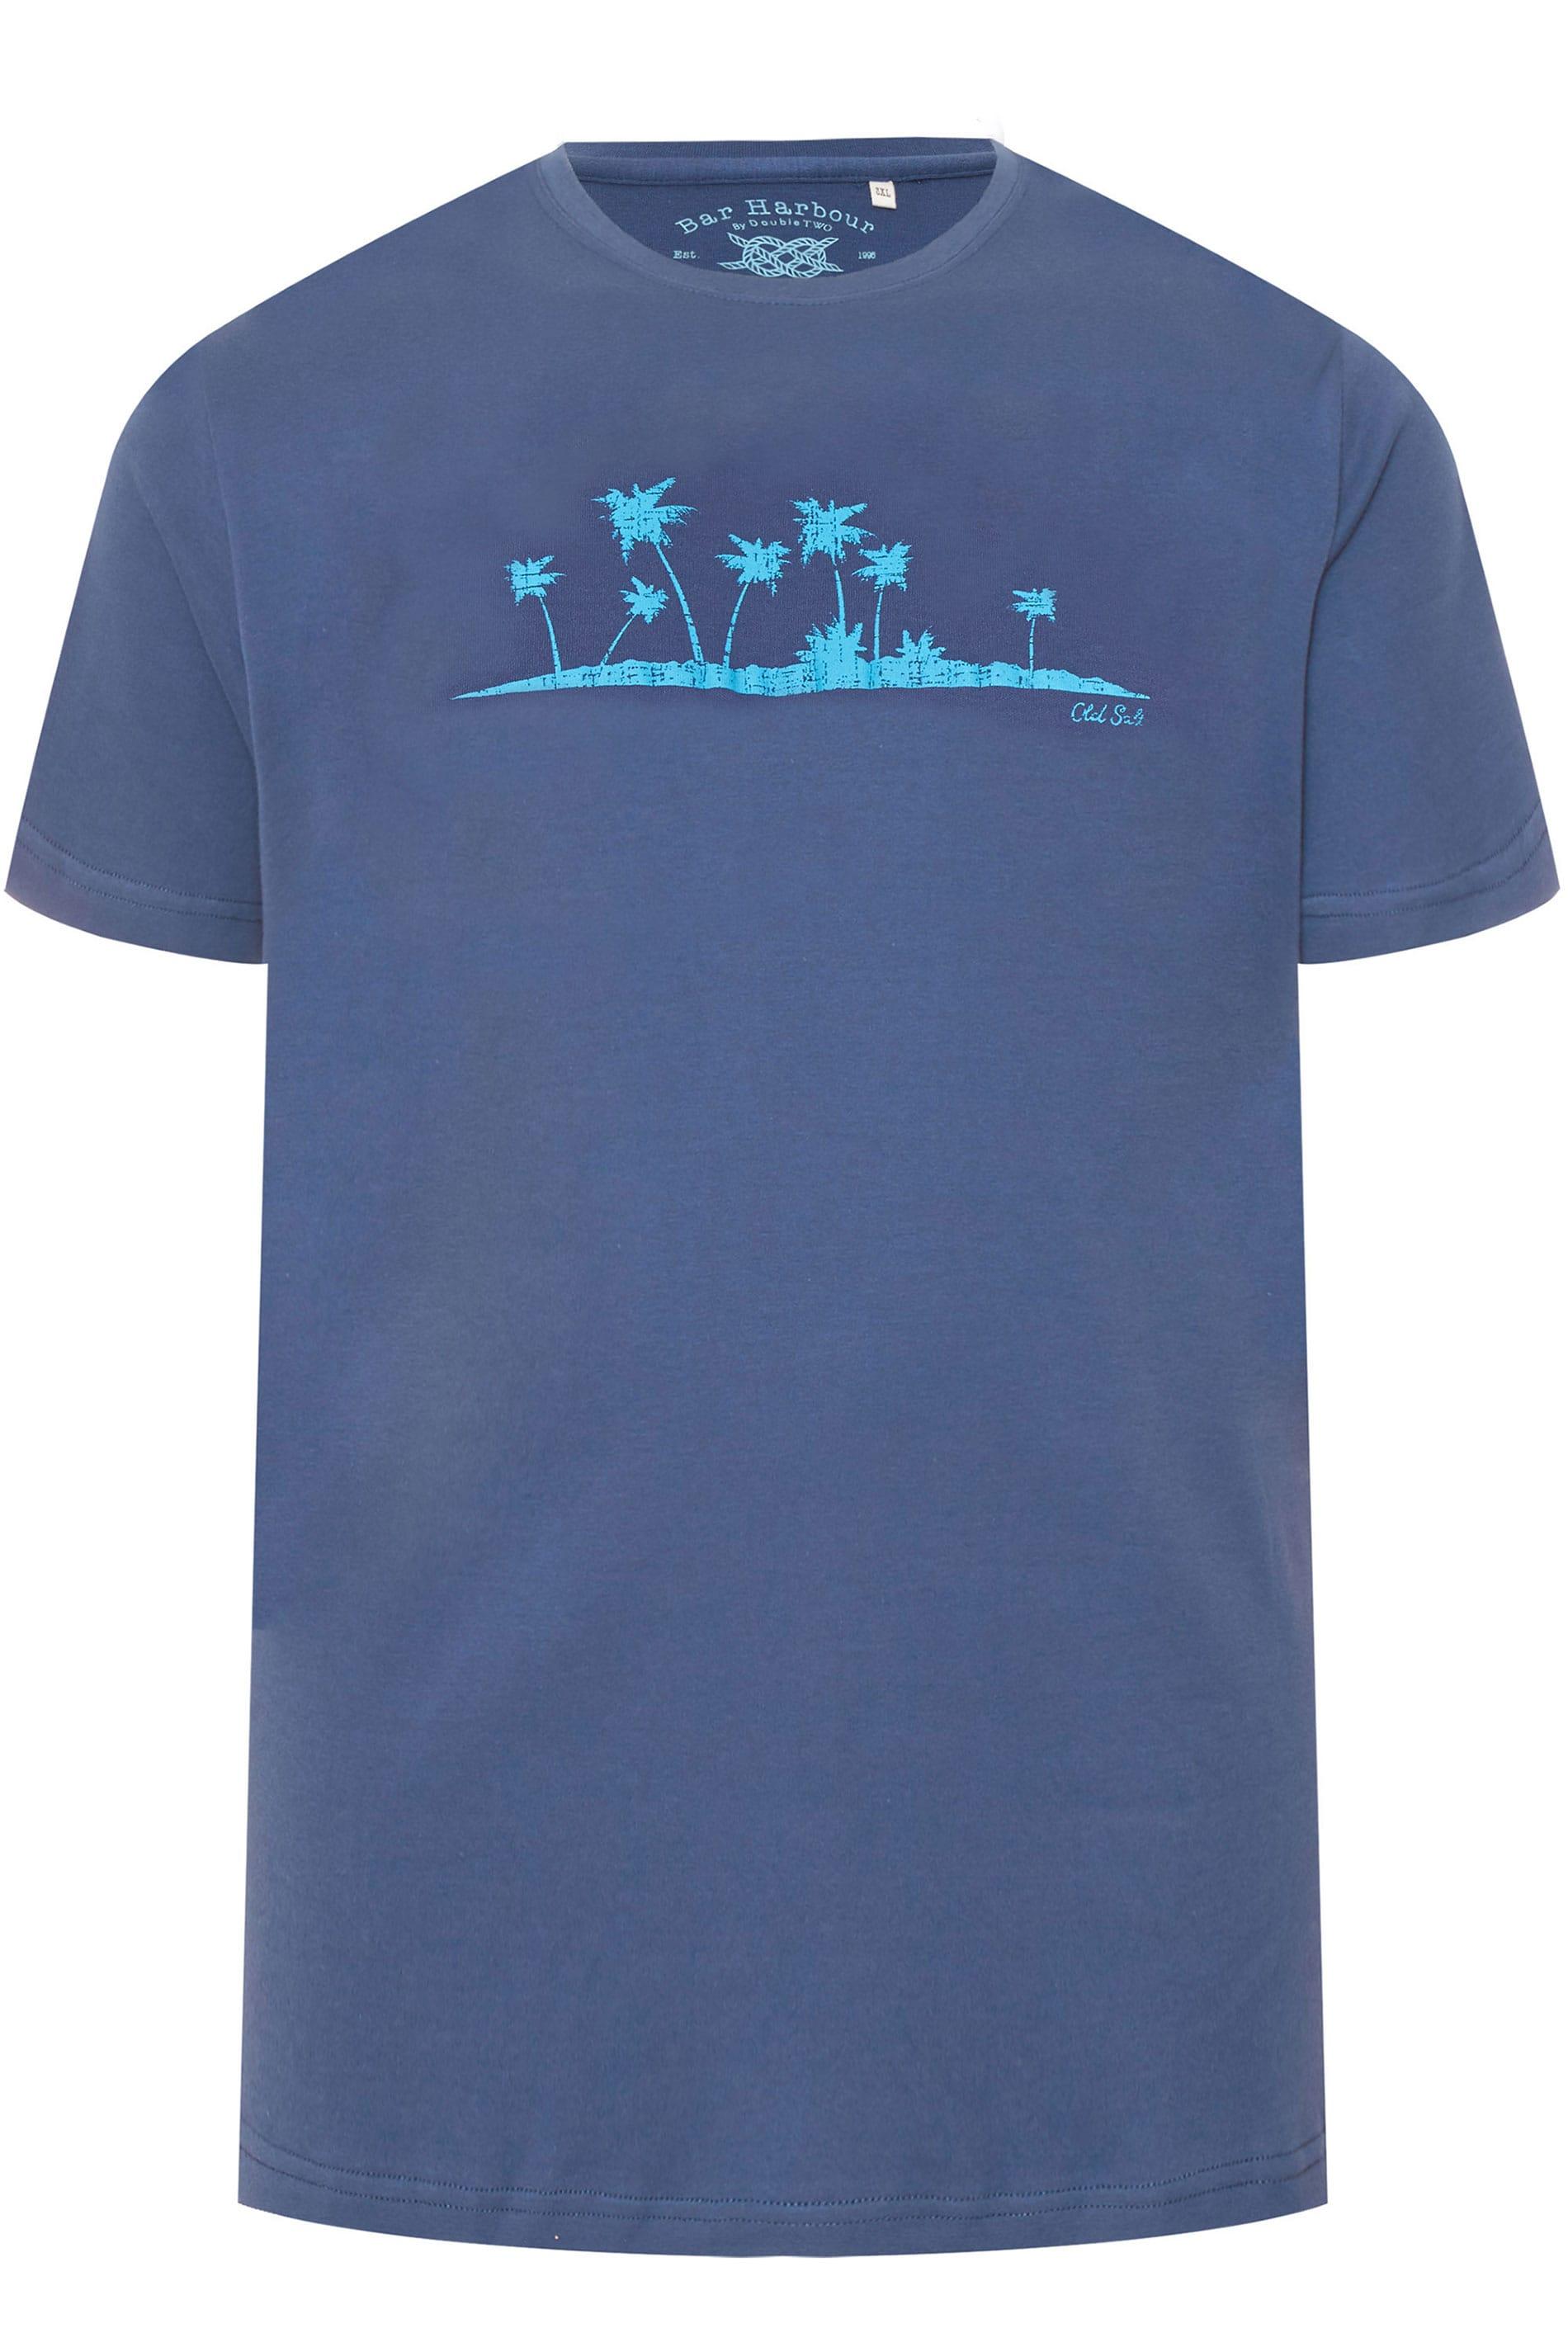 BAR HARBOUR Navy Palm Tree Printed T-Shirt